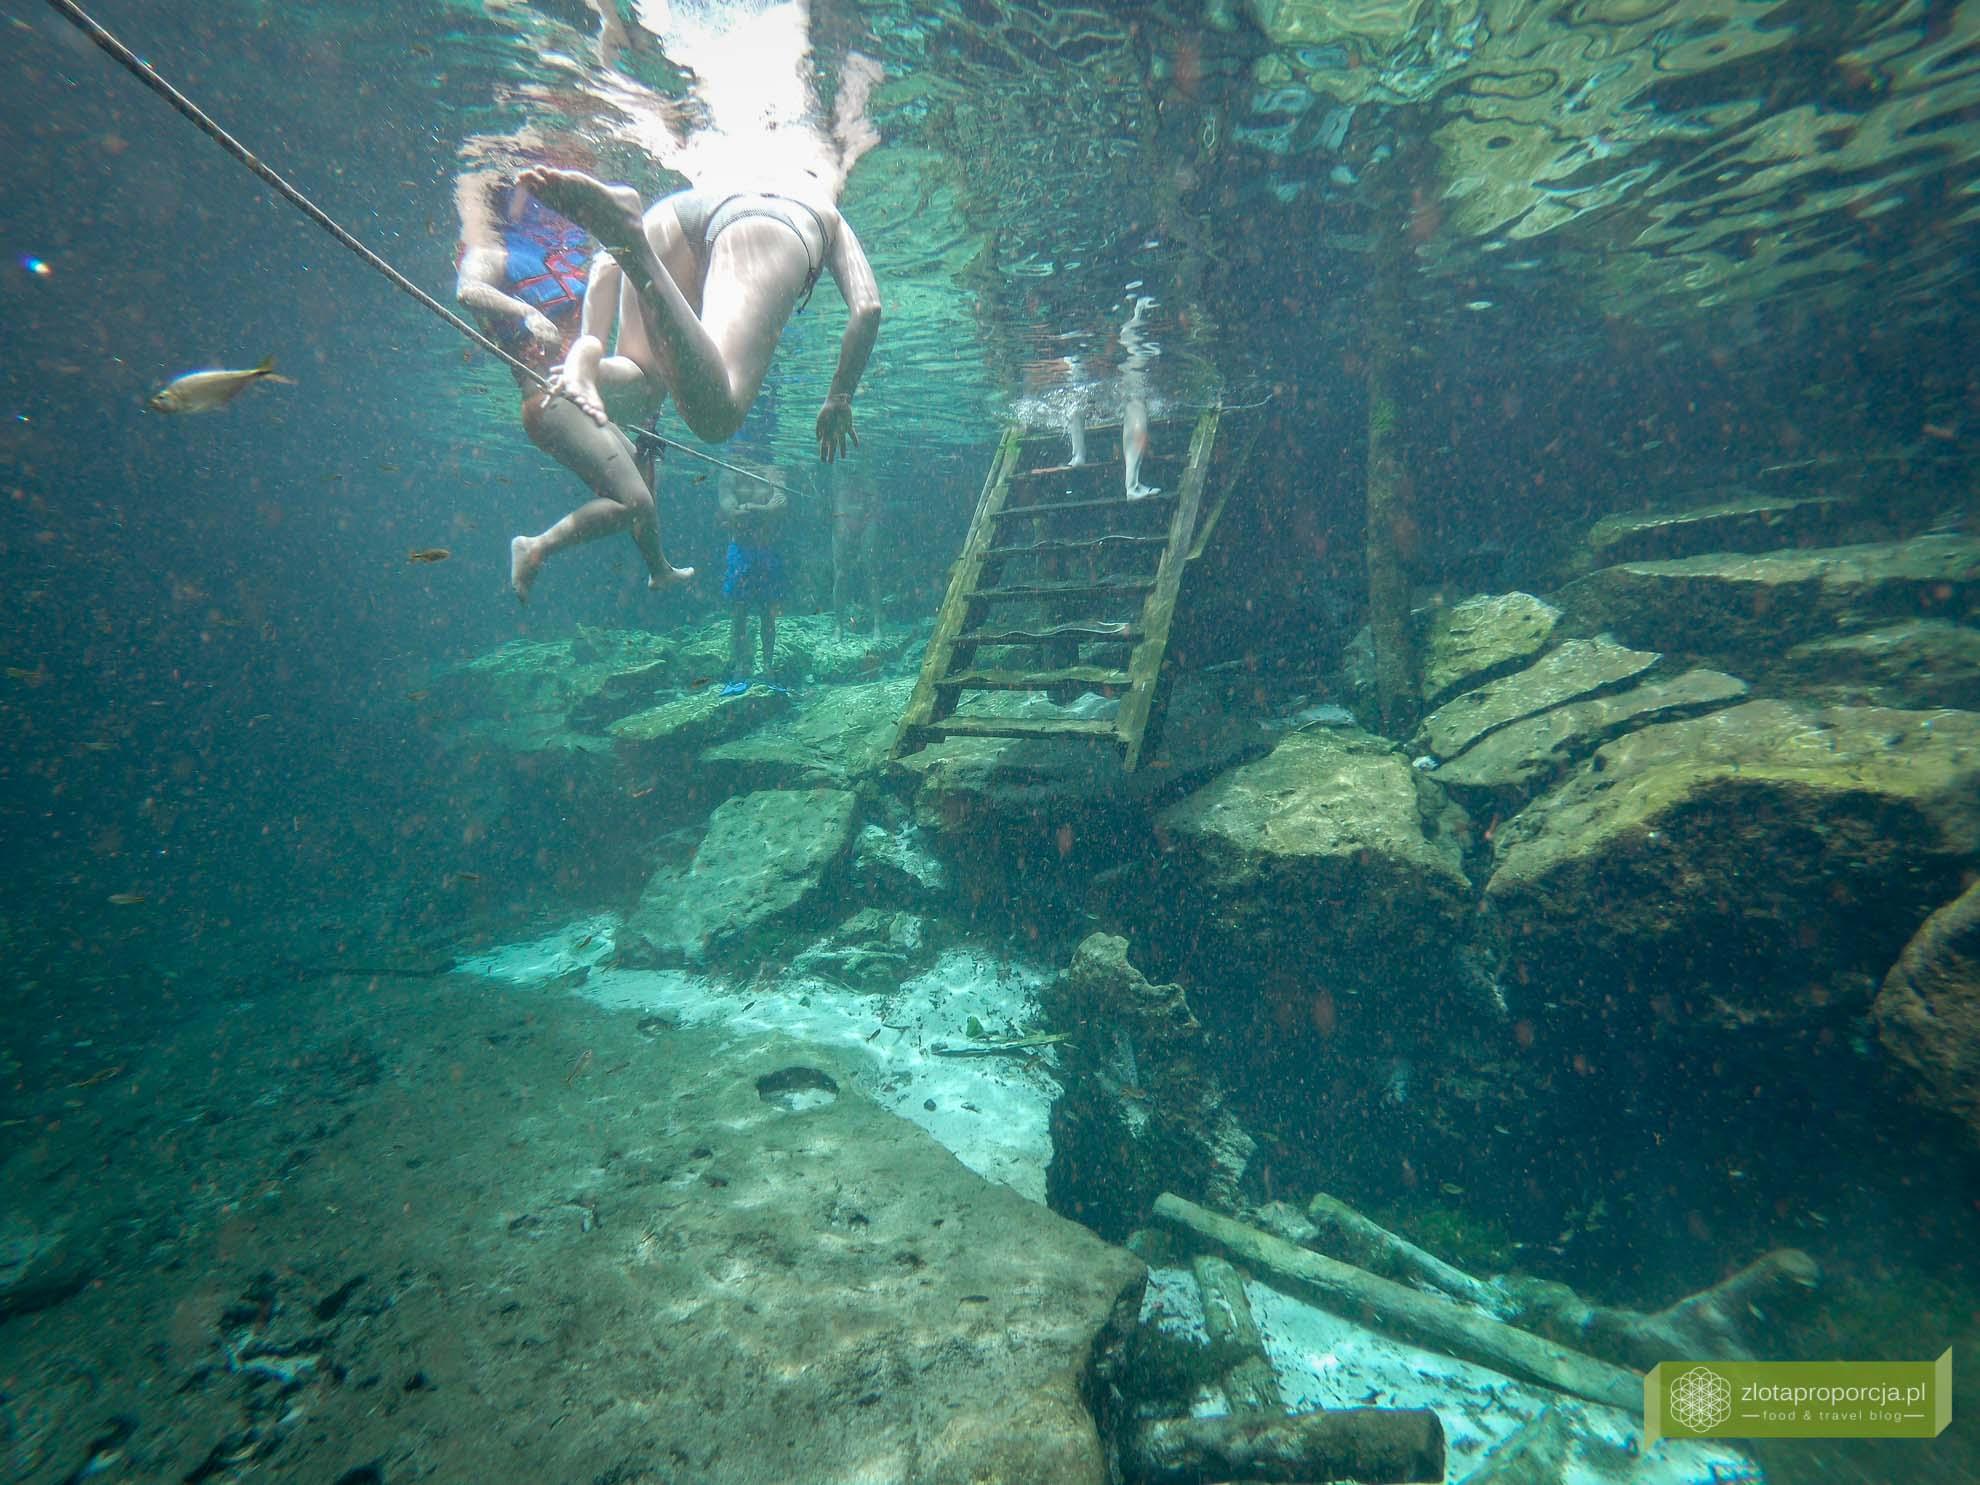 Jukatan; atrakcje Jukatan; cenoty; cenoty Meksyk; cenoty Jukatan; cenoty Tulum; okolice Tulum; plaża Xcacel; cenota Xcacel; rezerwat żółwi Tulum;